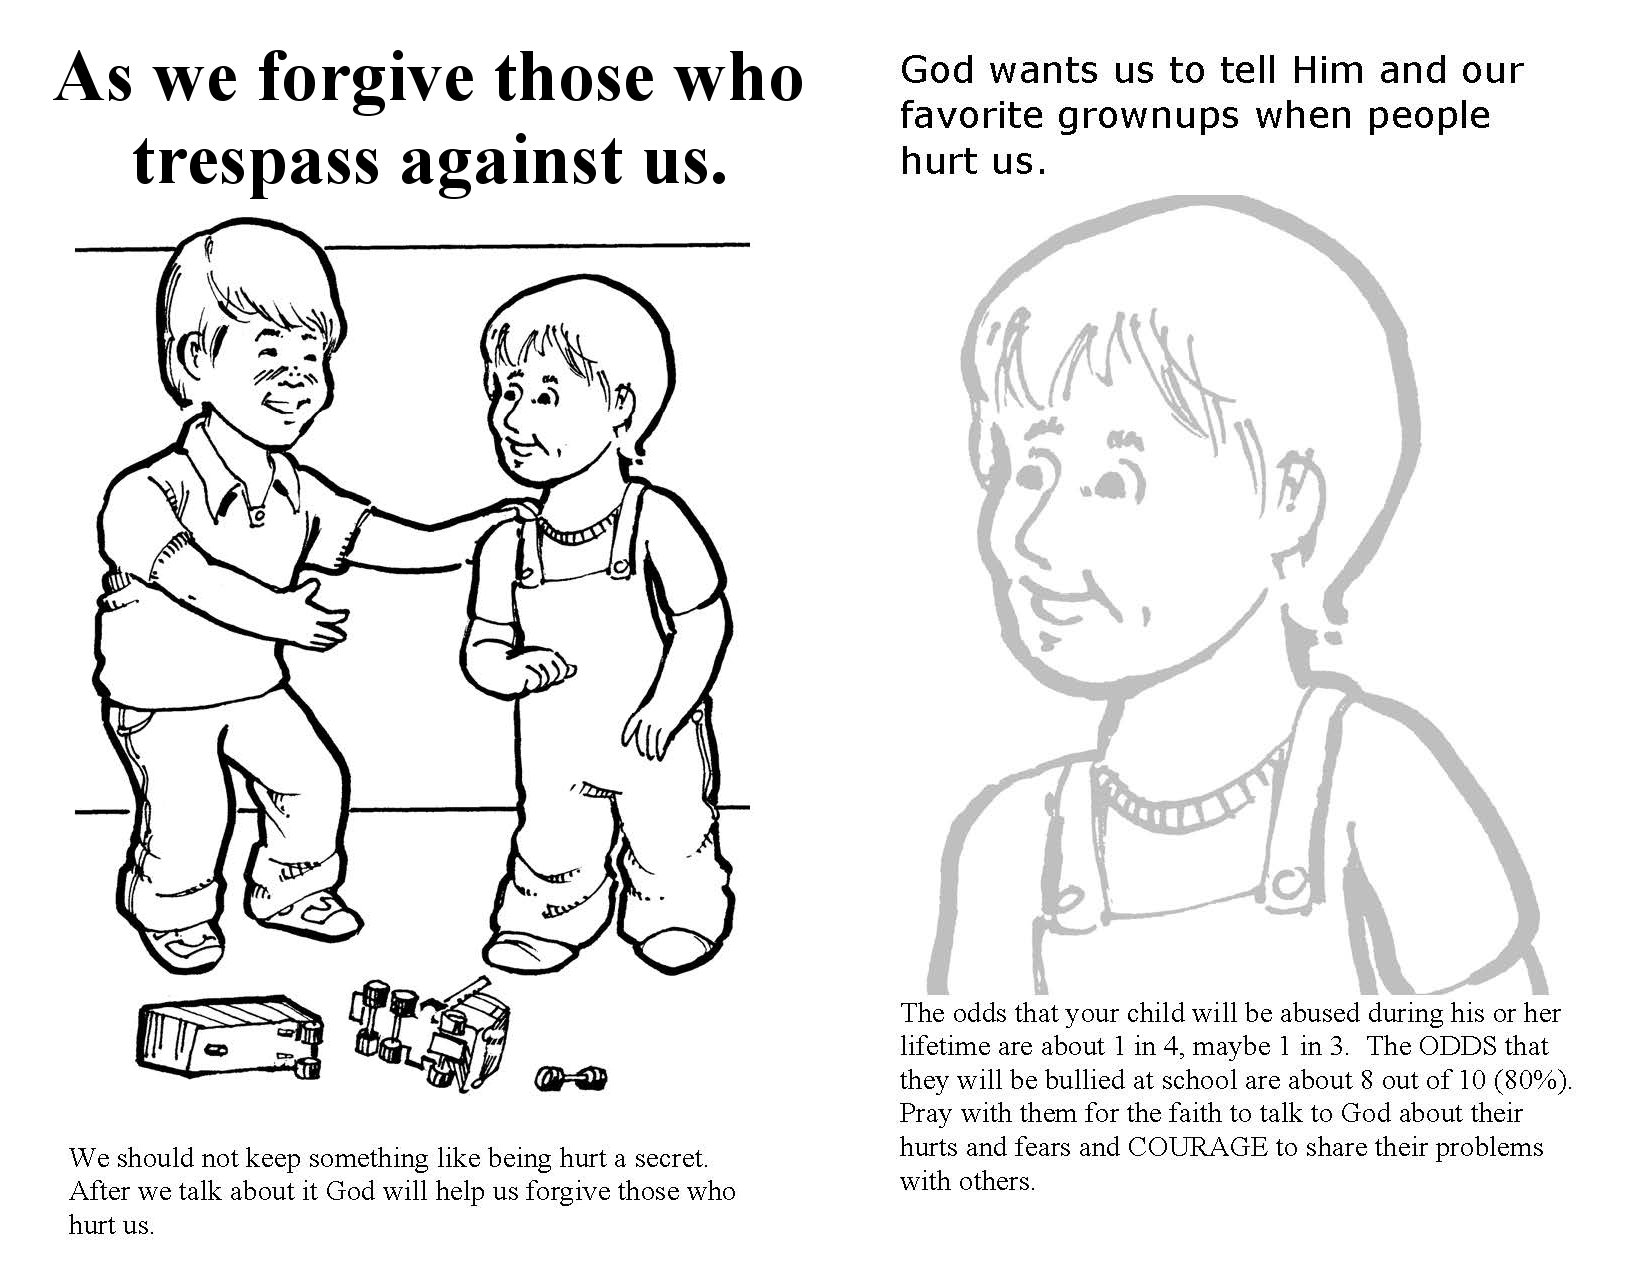 Free Church bulletin about prayer